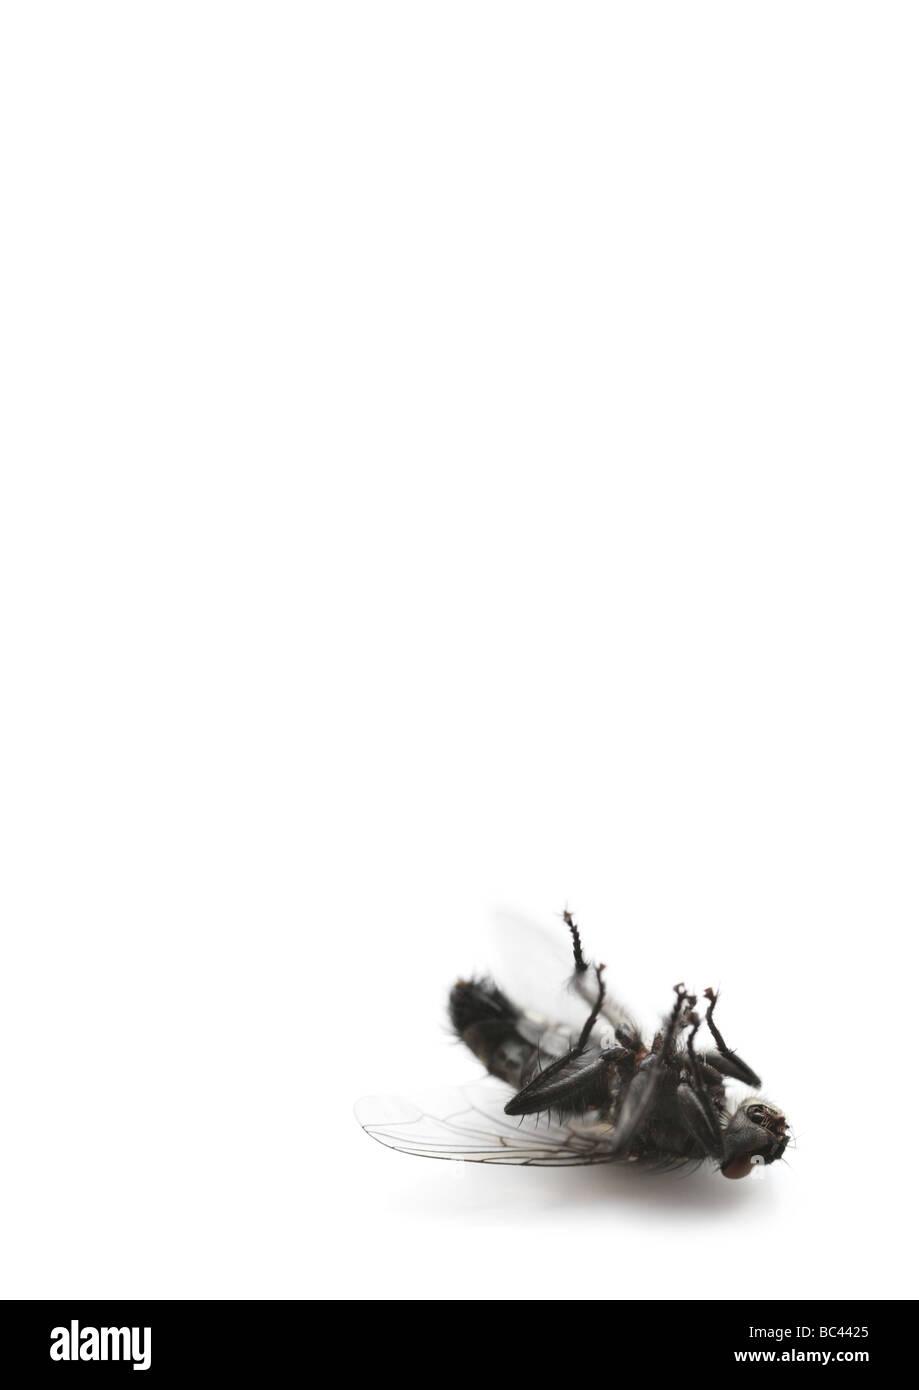 dead housefly - Stock Image